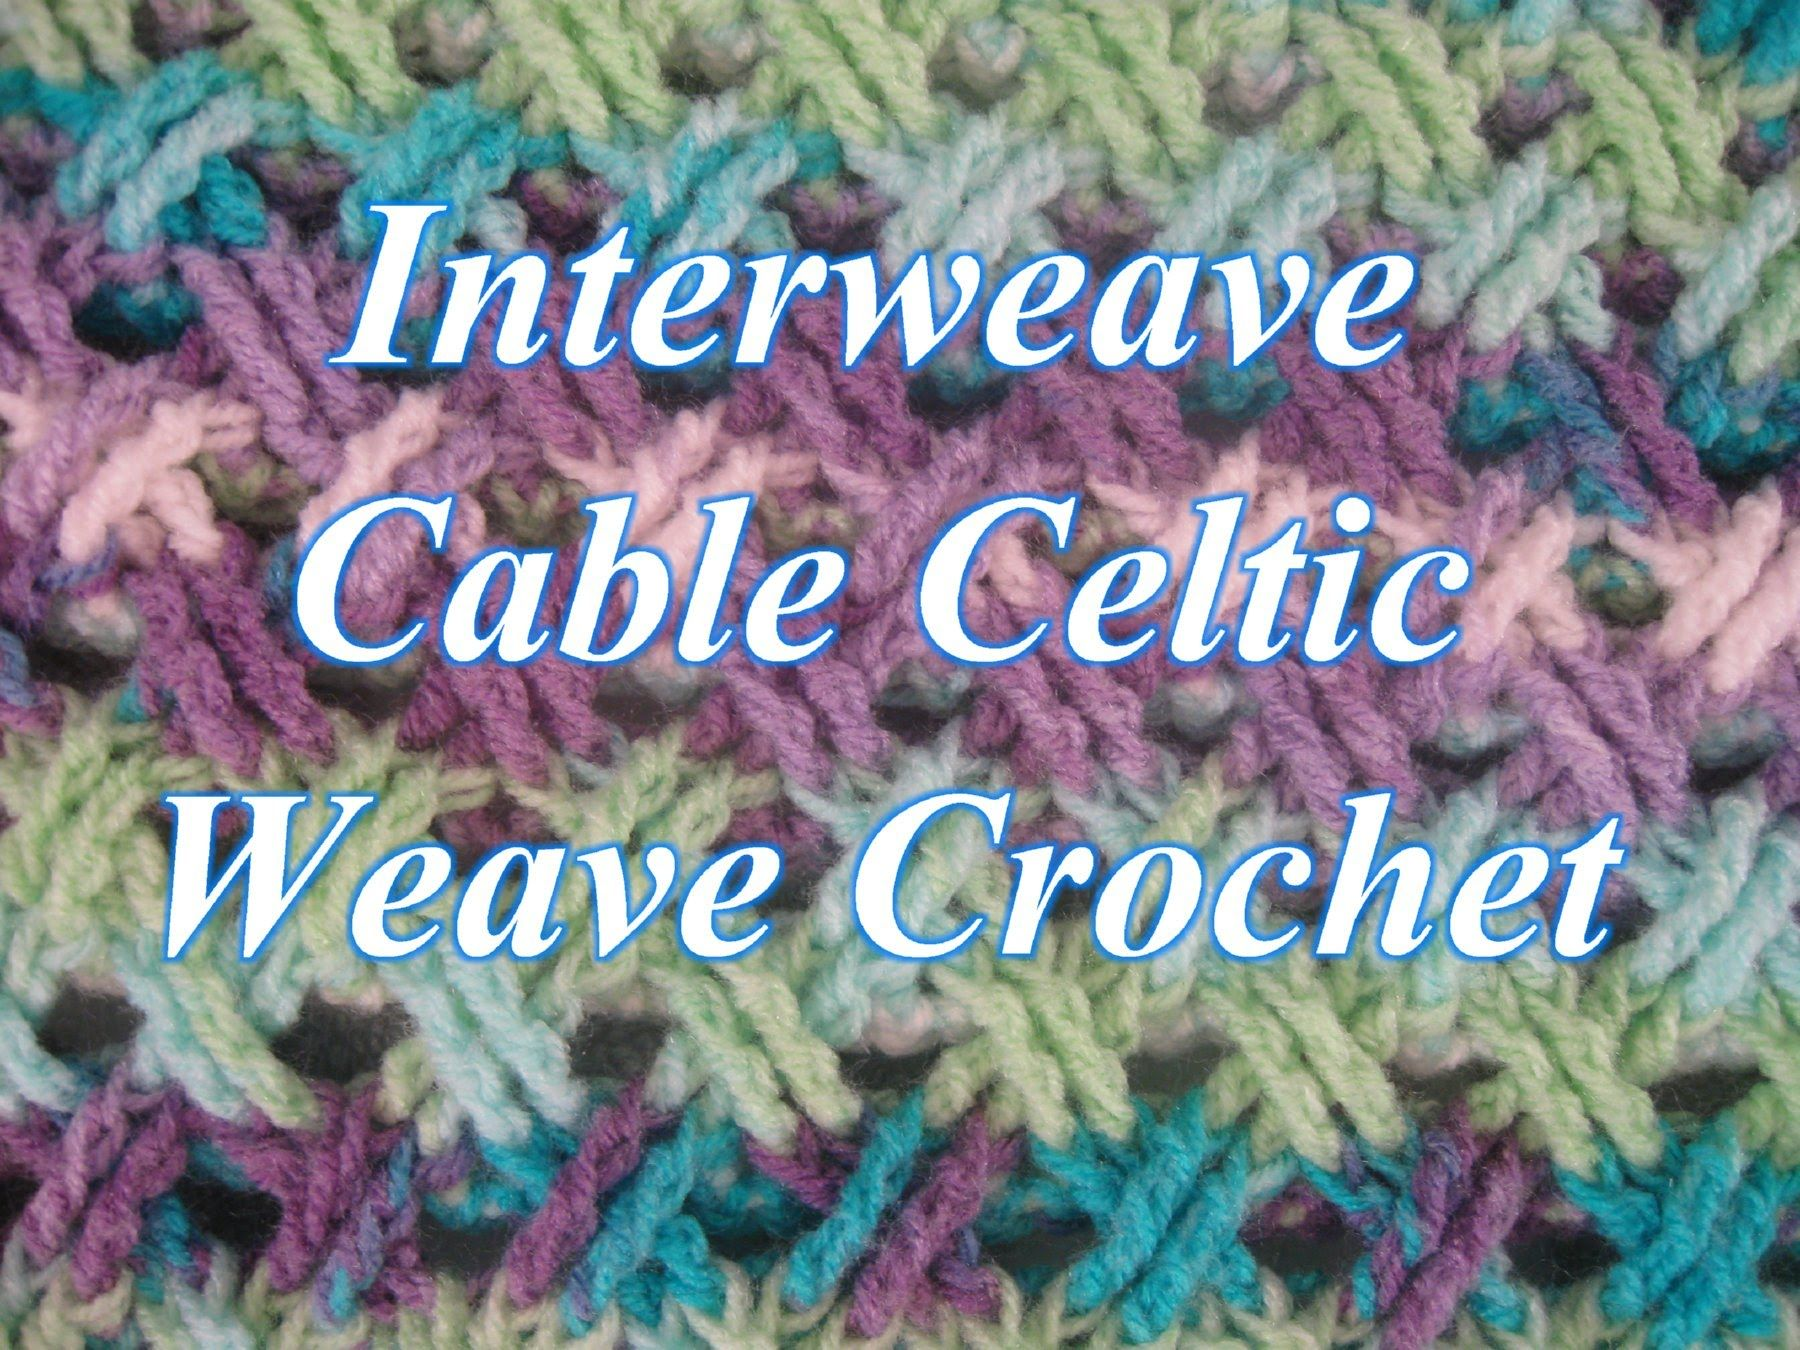 Interweave Cable Celtic Weave Crochet Stitch - Crochet Stitch ...